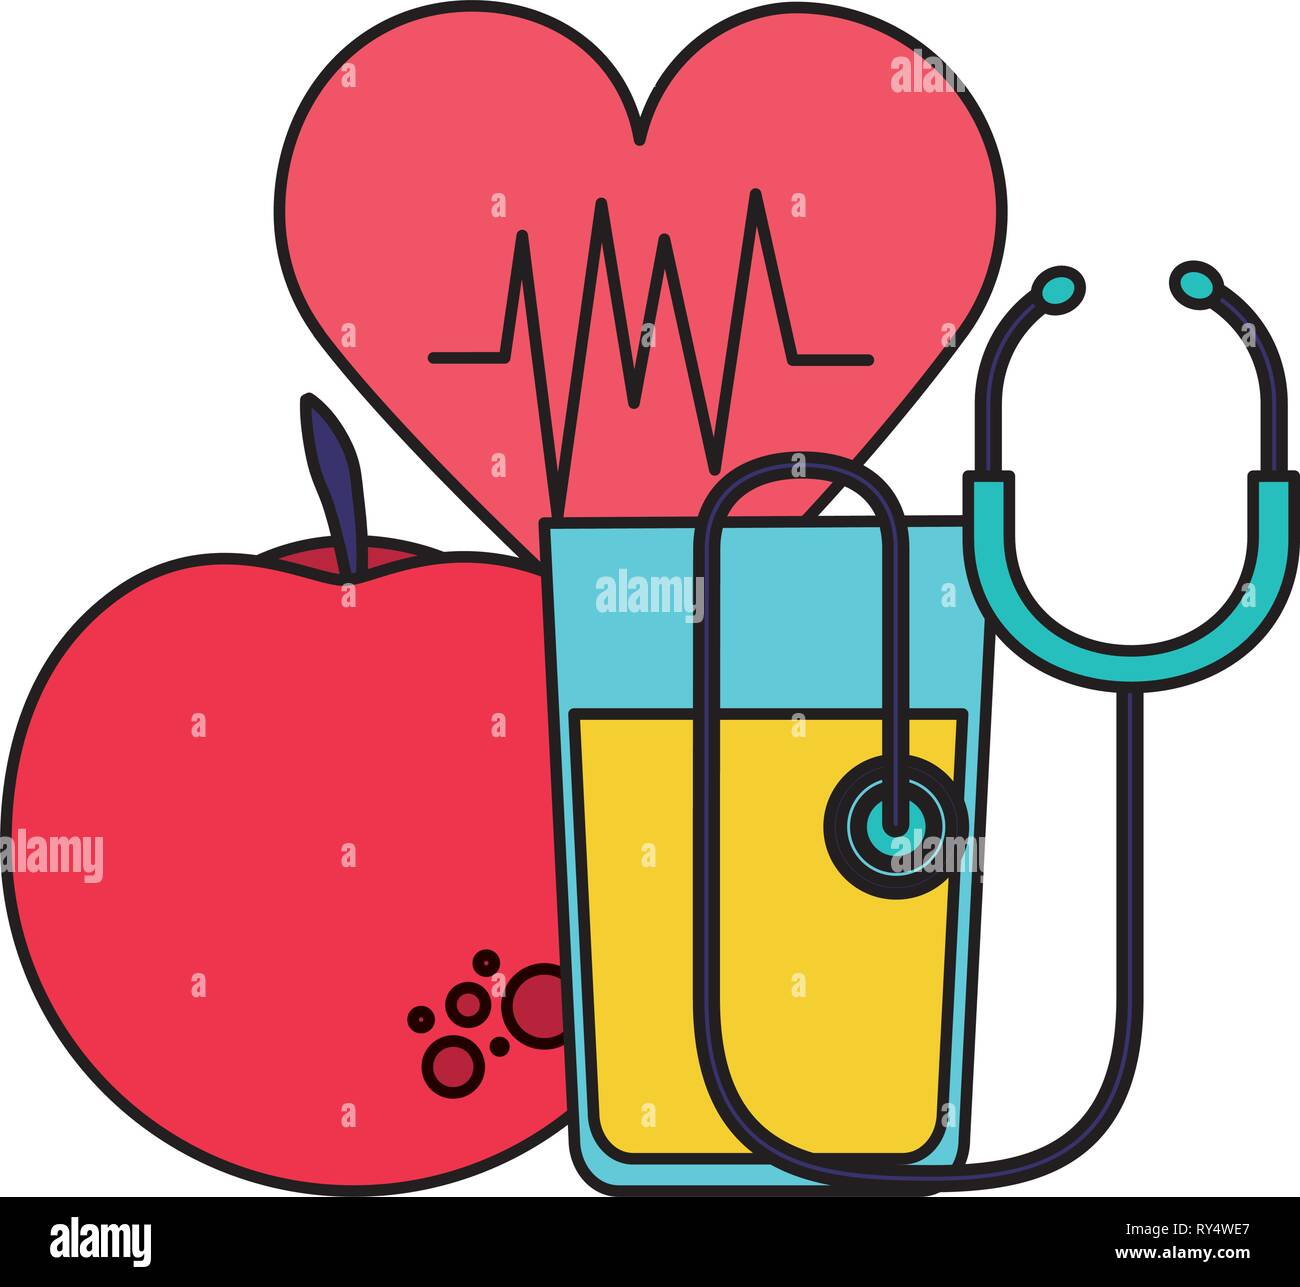 Heartbeat Stock Photos Amp Heartbeat Stock Images Alamy